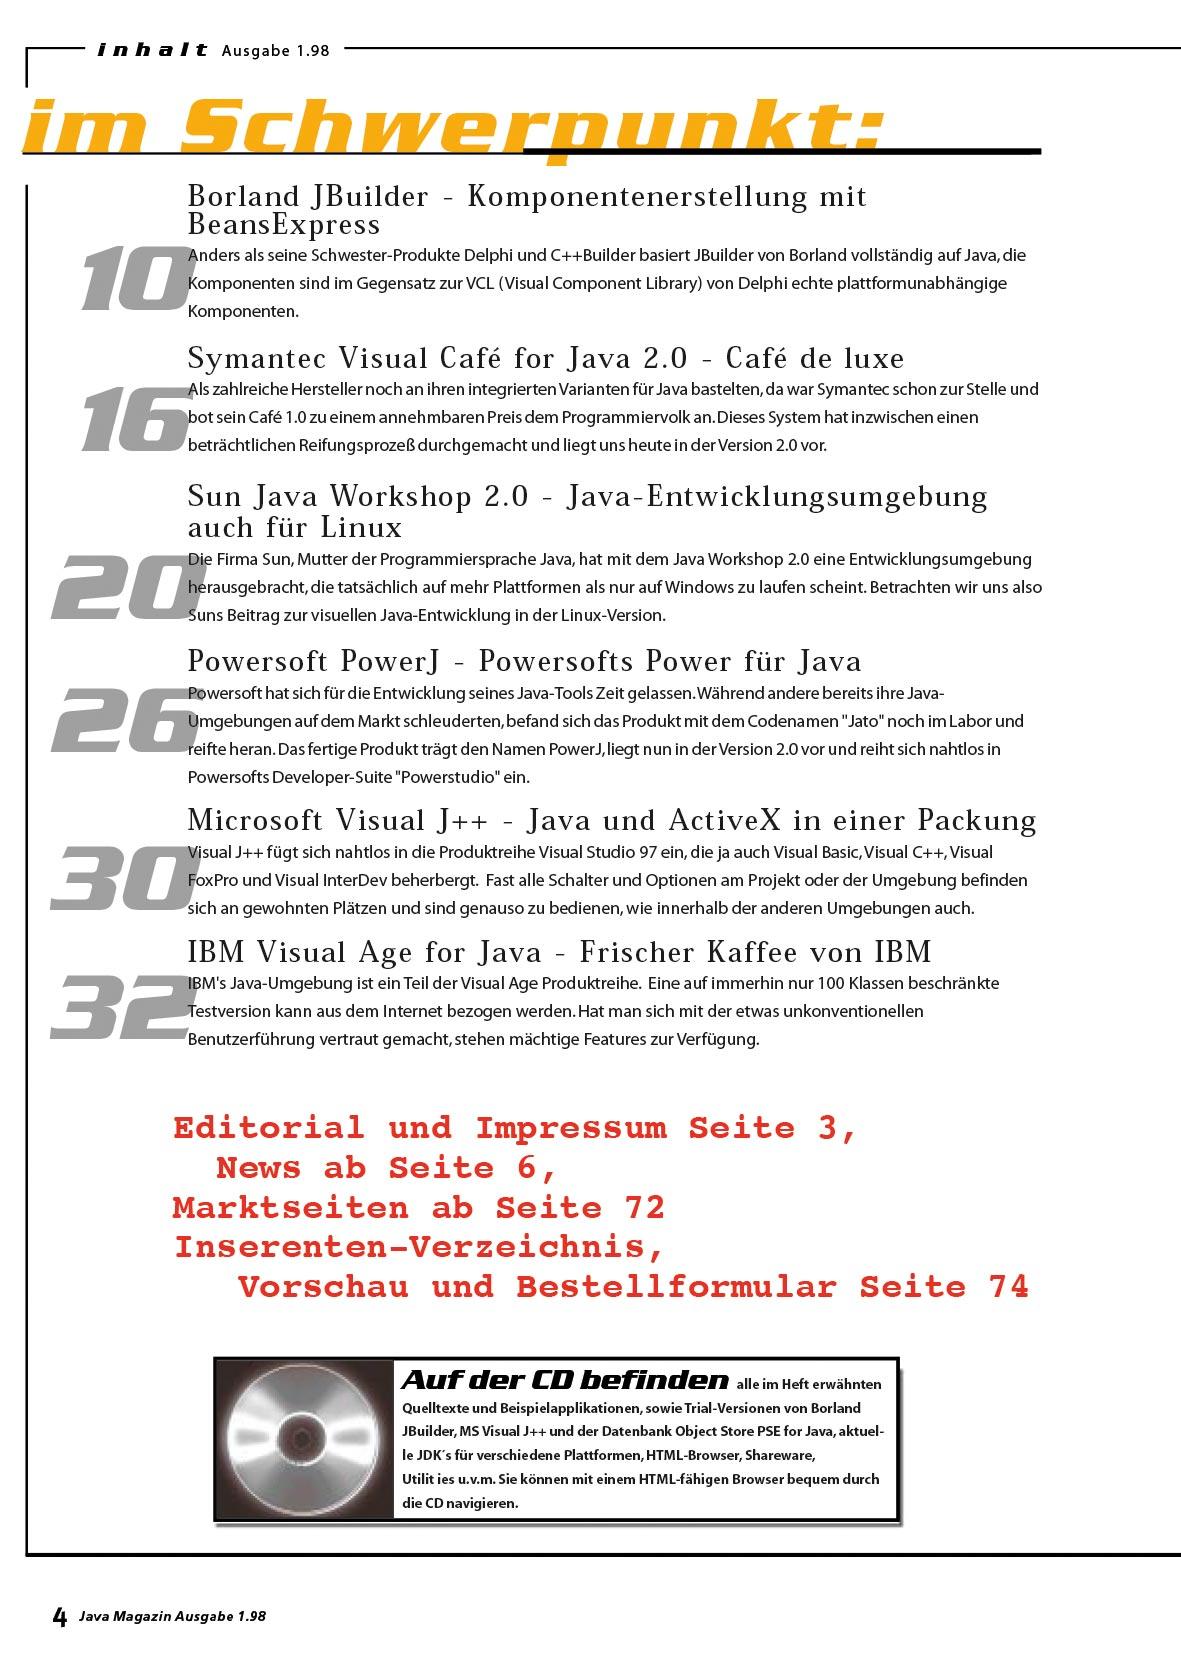 jm_1_1998-3.tif_fmt1.jpg